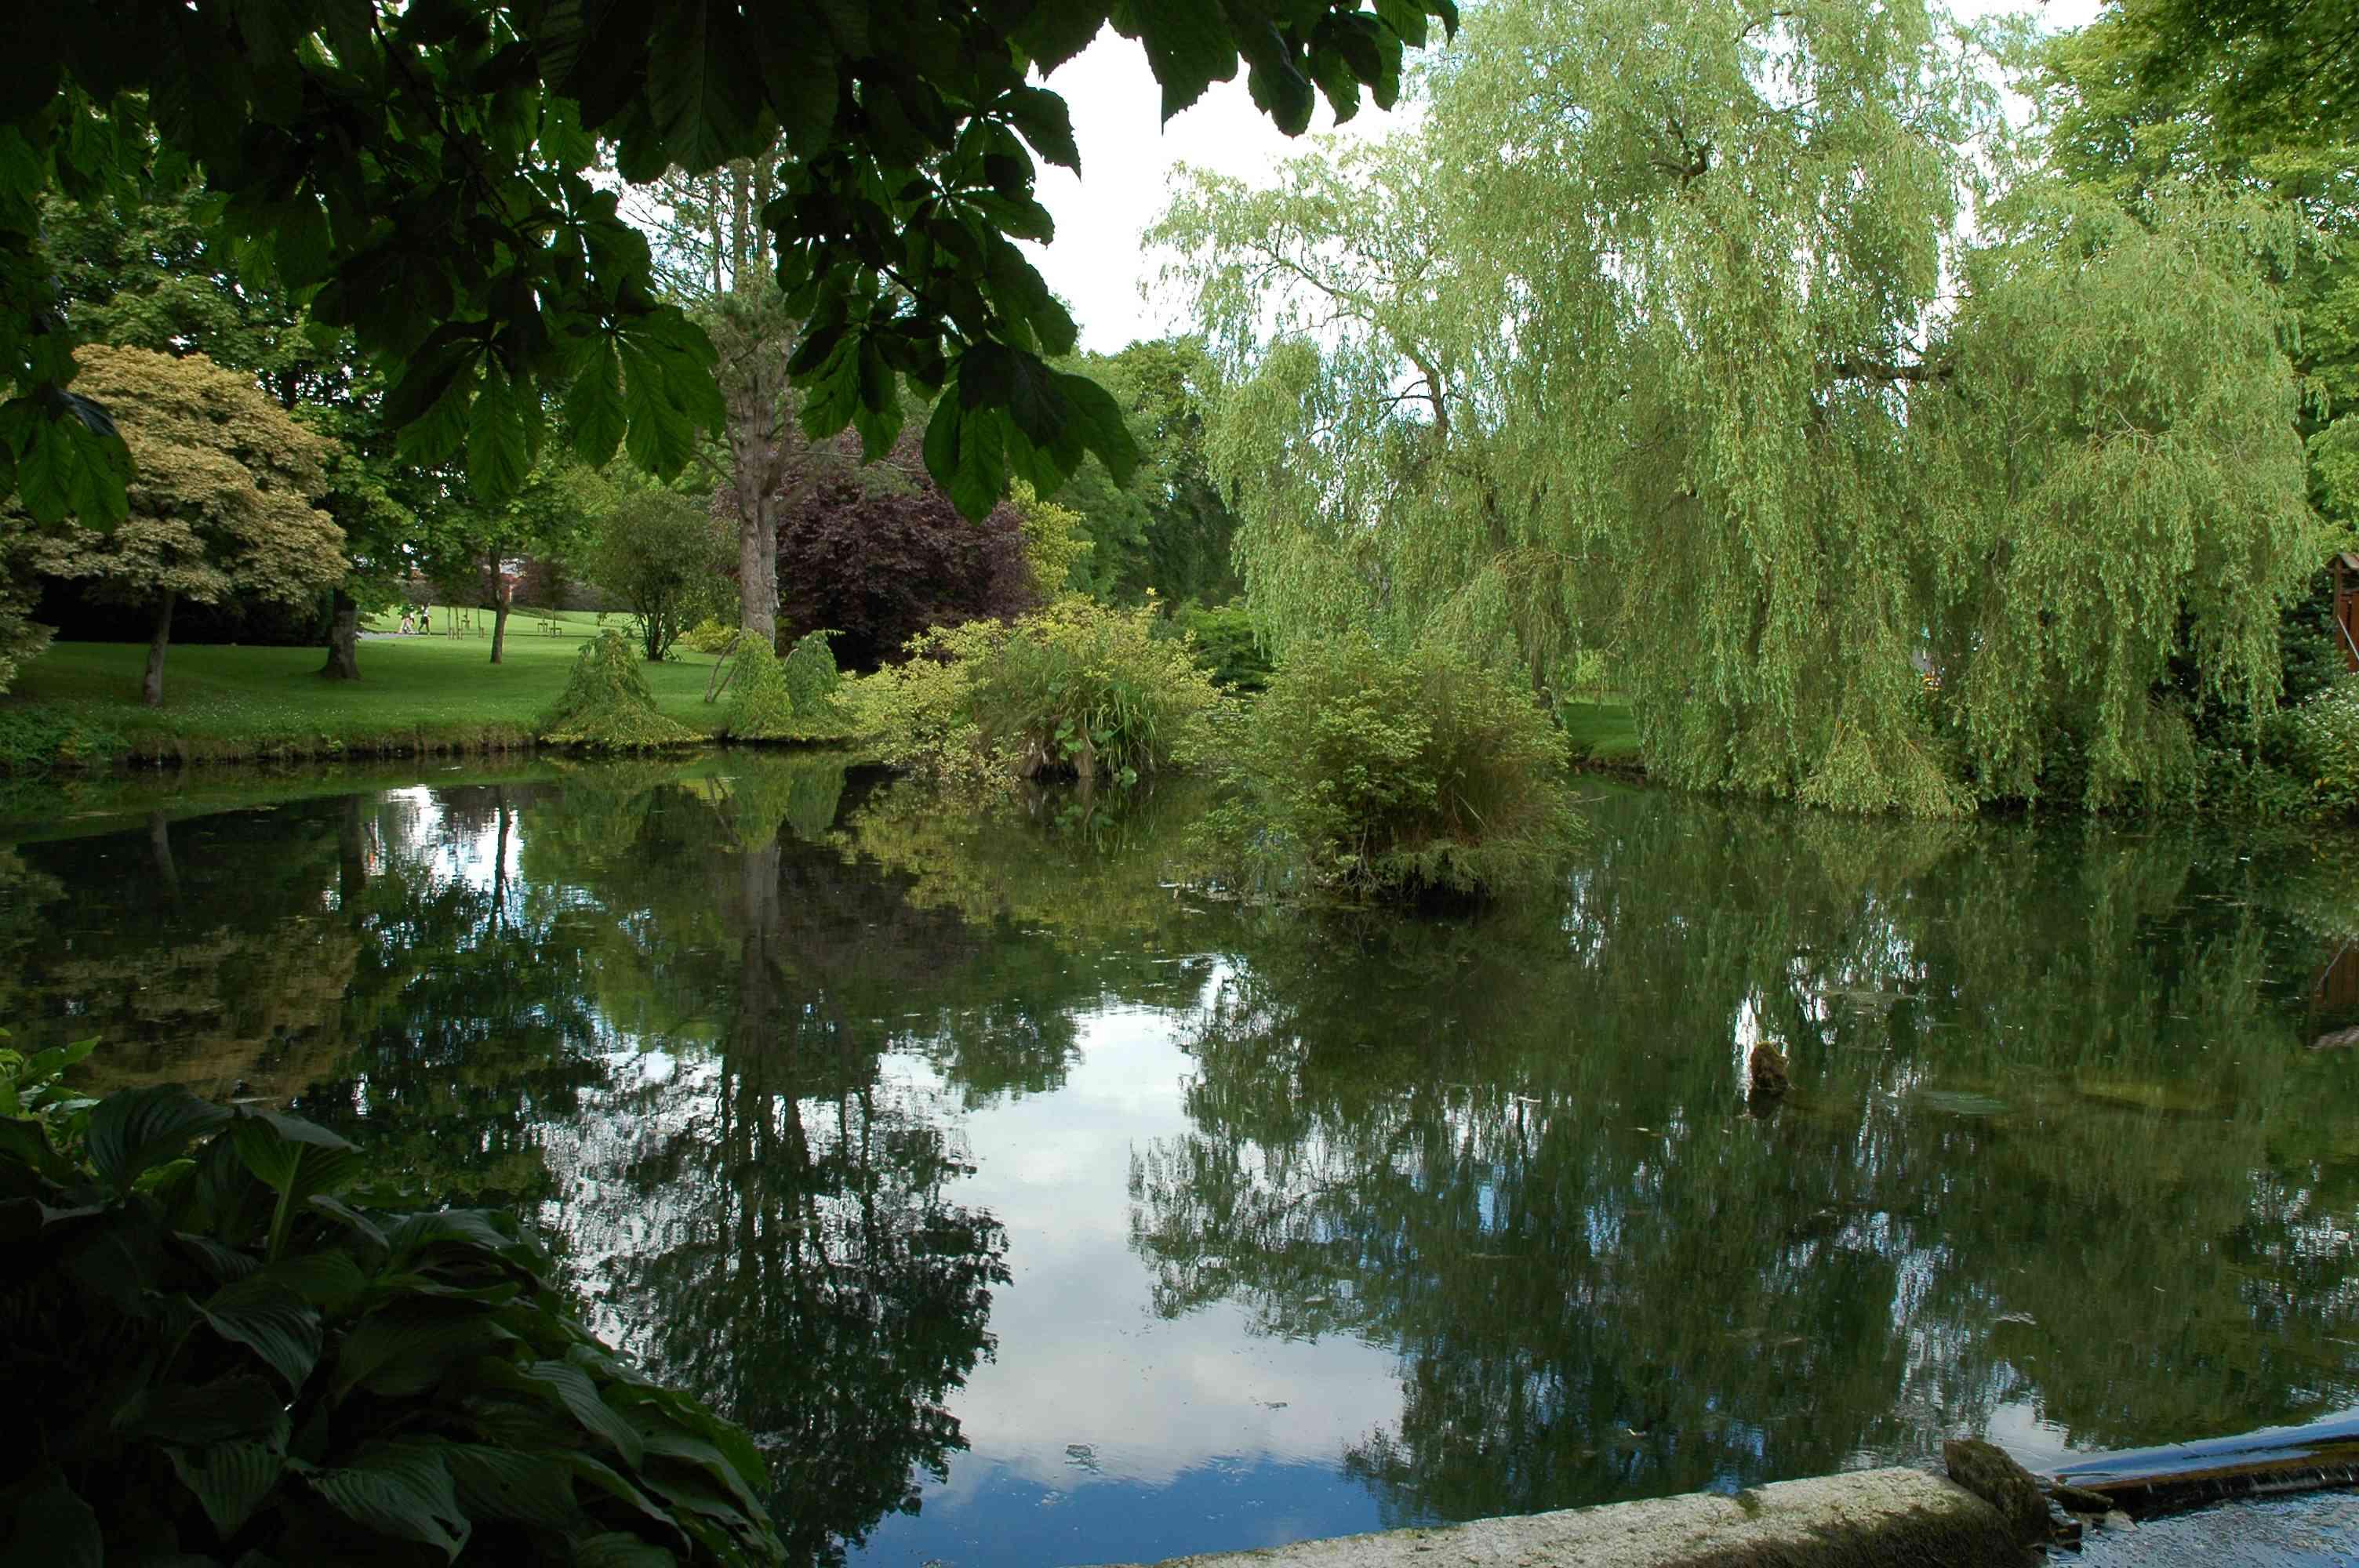 The Irish National Stud and Japanese Gardens